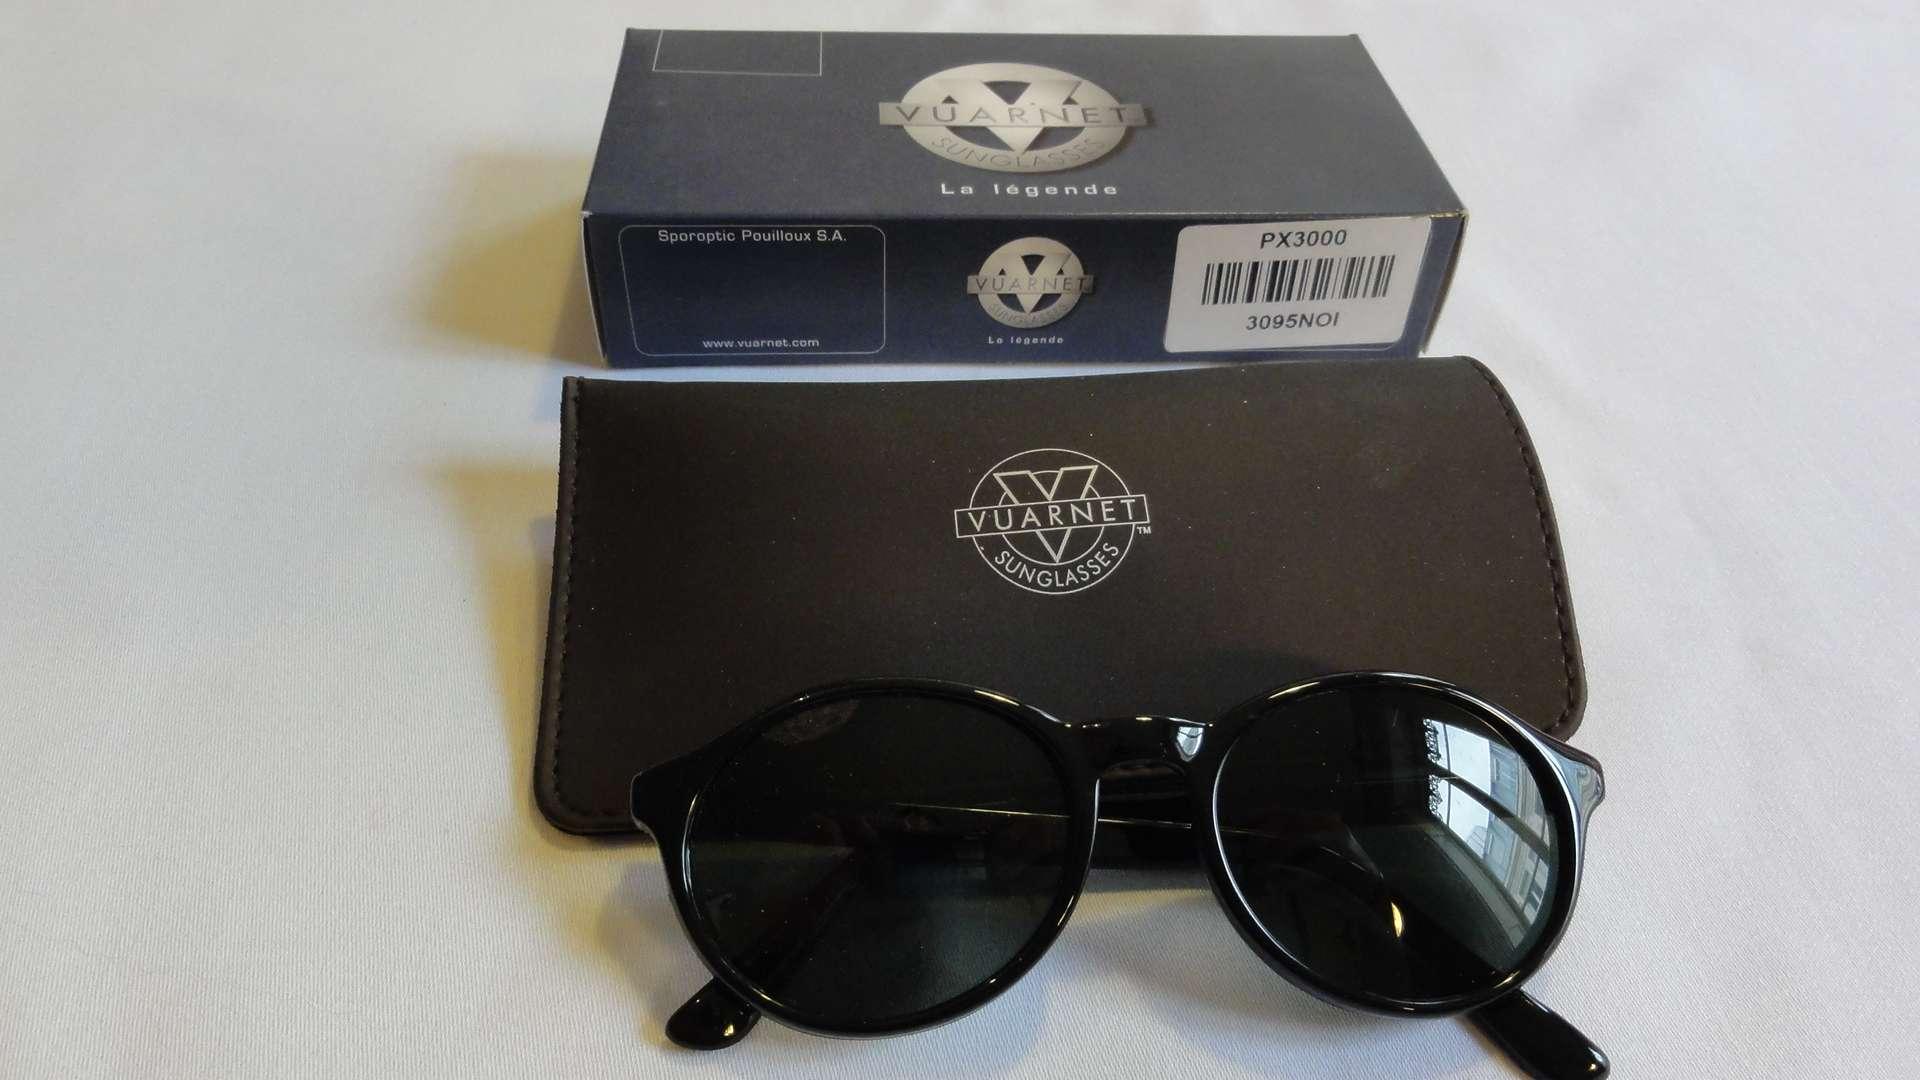 extreme sports sunglasses  px3000 sunglasses